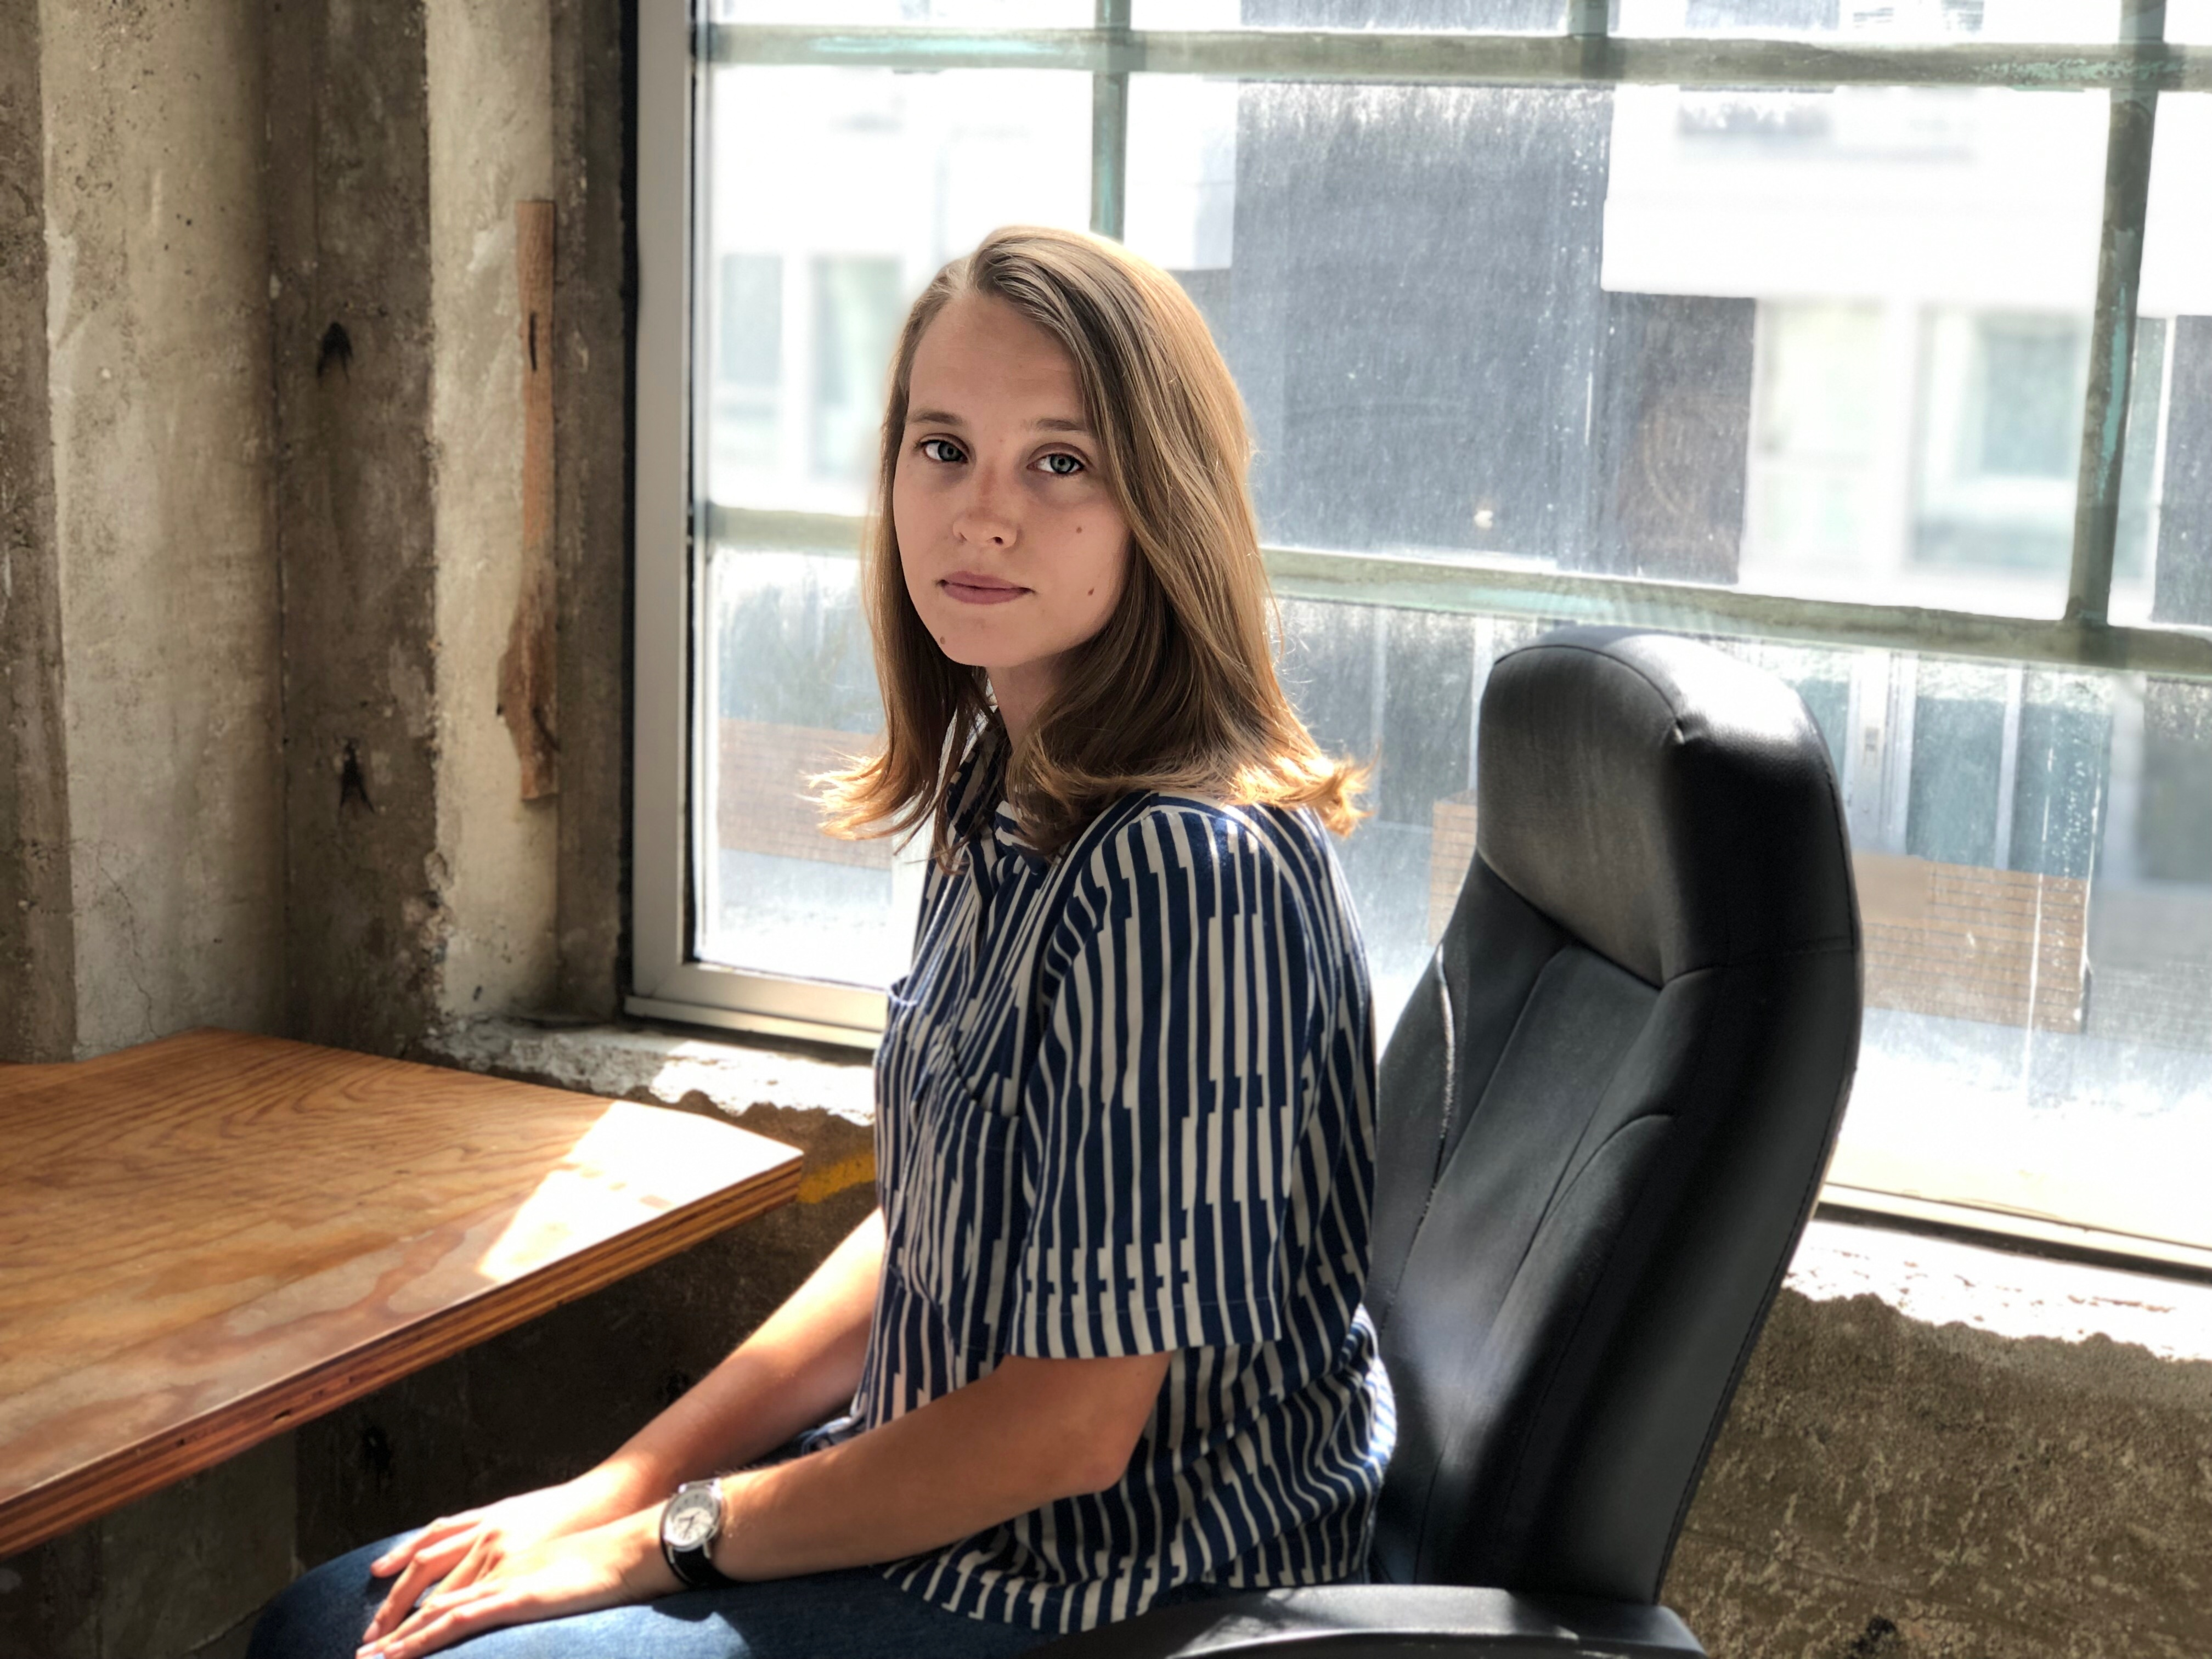 girl sitting desk window